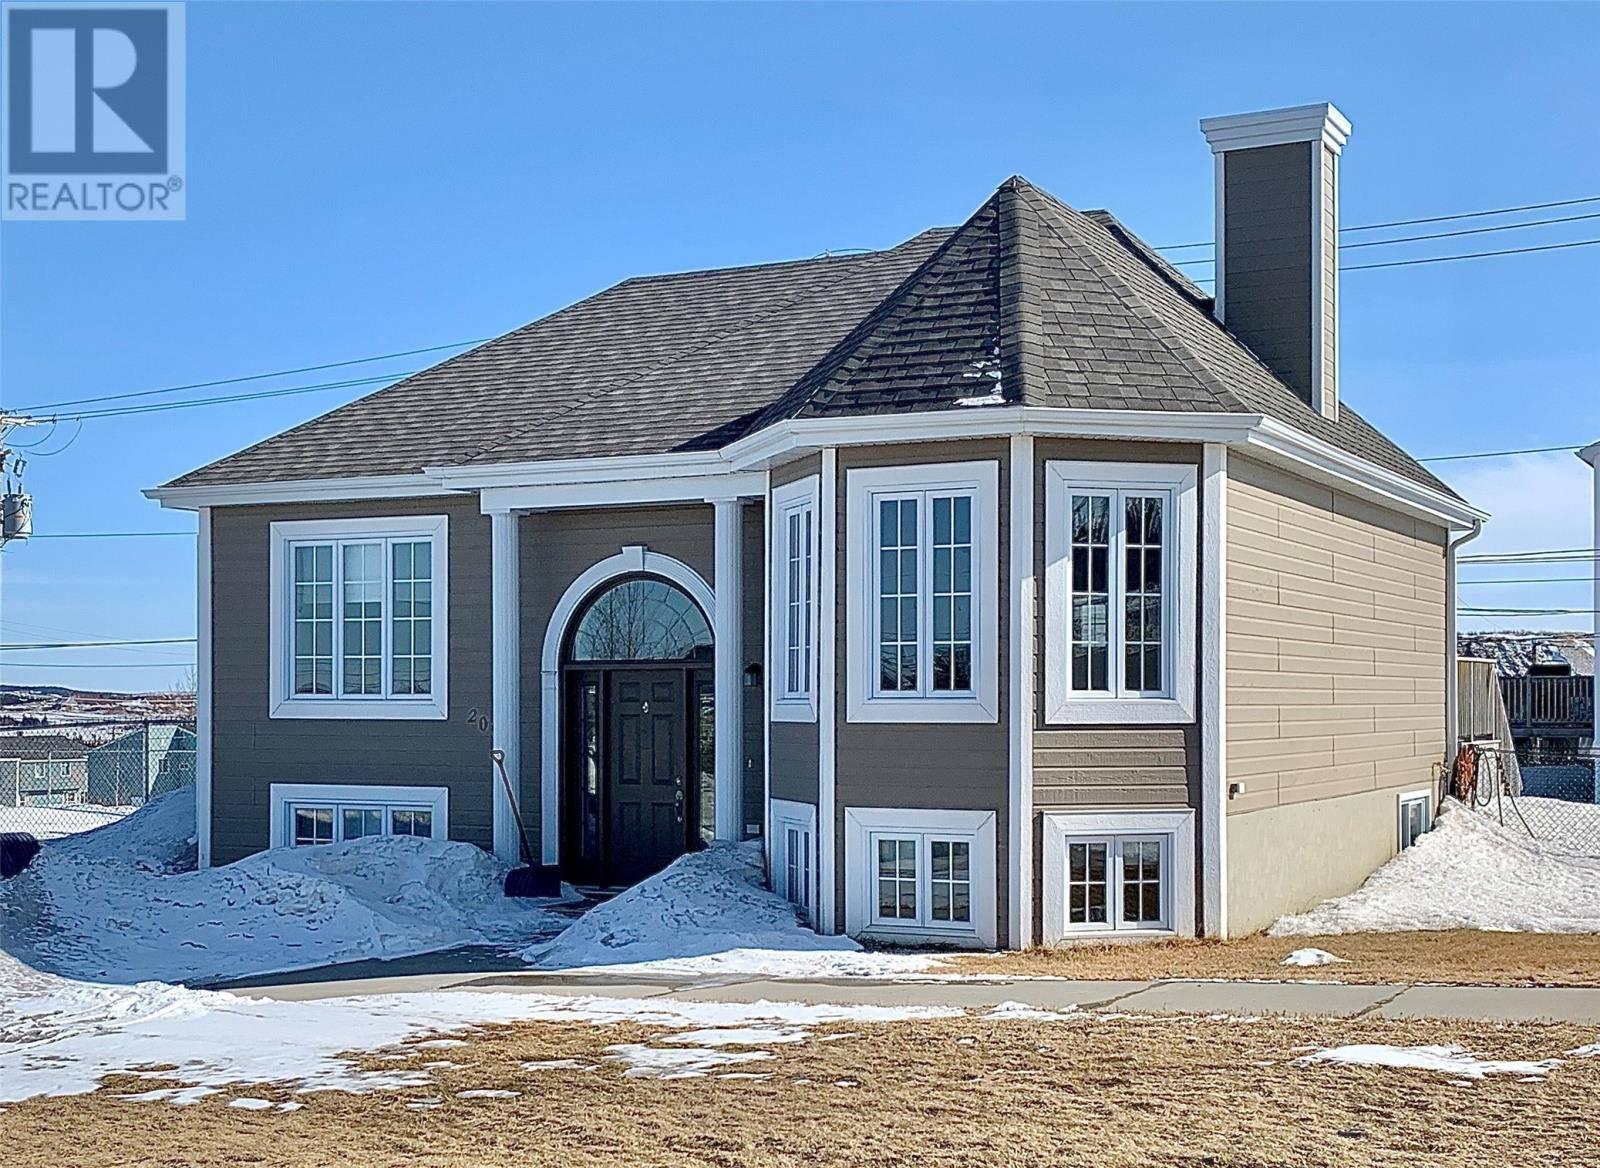 House for sale at 201 Sparrow St Labrador City Newfoundland - MLS: 1212963